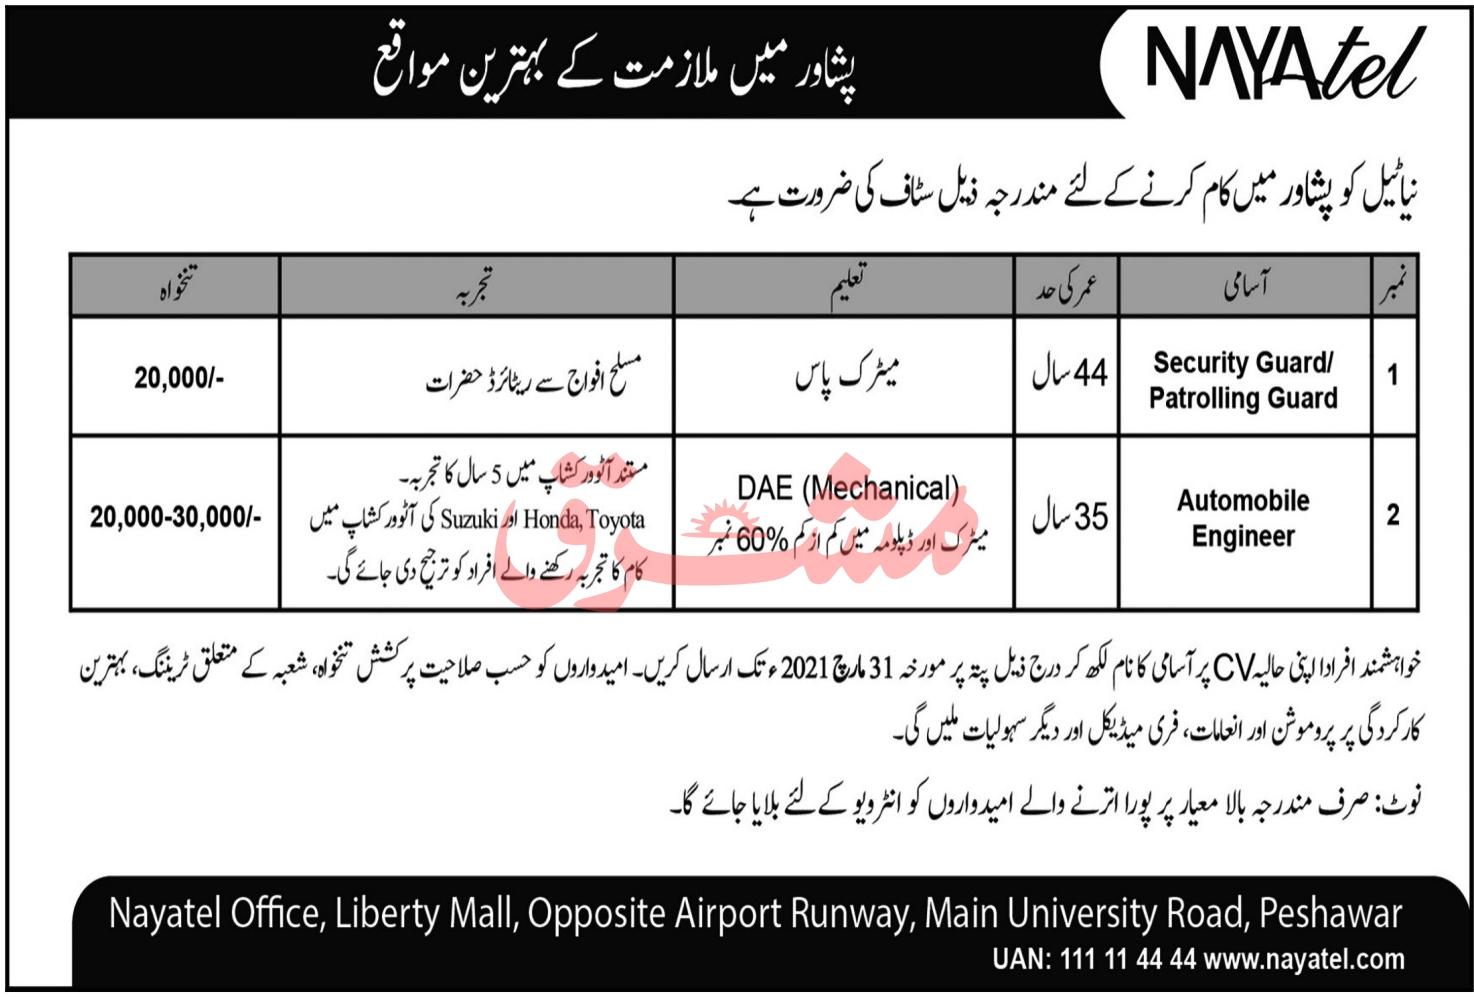 Nayatel Jobs For DAE - Nayatel Jobs Apply - Nayatel Pvt Ltd - Nayatel Careers - Nayatel Jobs 2021 in Pakistan